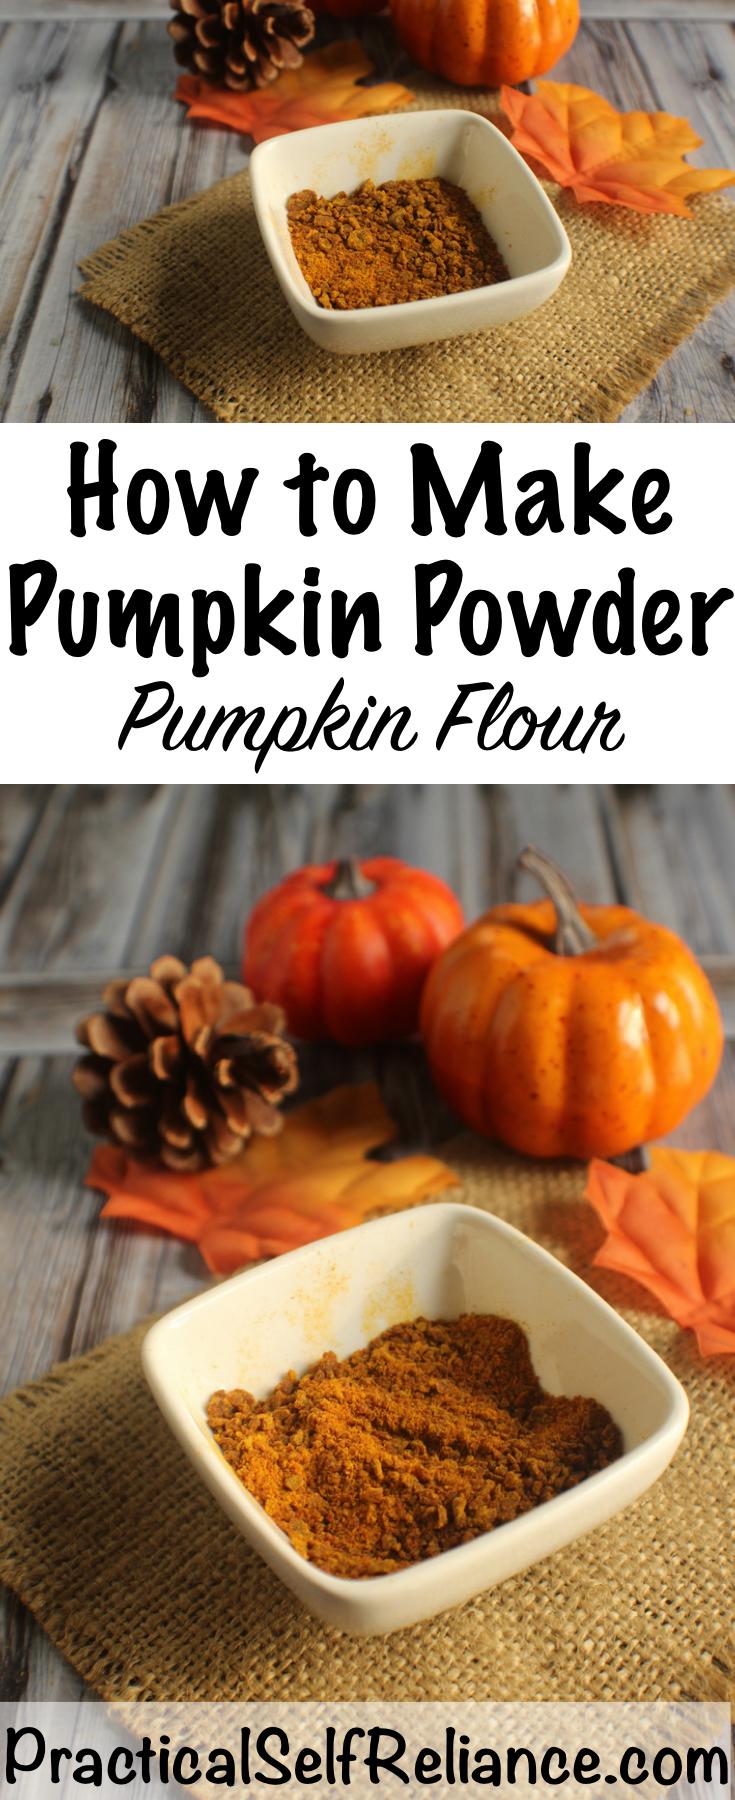 How to Make Pumpkin Powder (Pumpkin Flour) ~ Dehydrating Pumpkin Puree #pumkin #recipes #pumpkinrecipes #pumpkinflour #pumpkinpiespice #foodpreservation #dehydrating #selfsufficiency #preparedness #prepper #homesteading